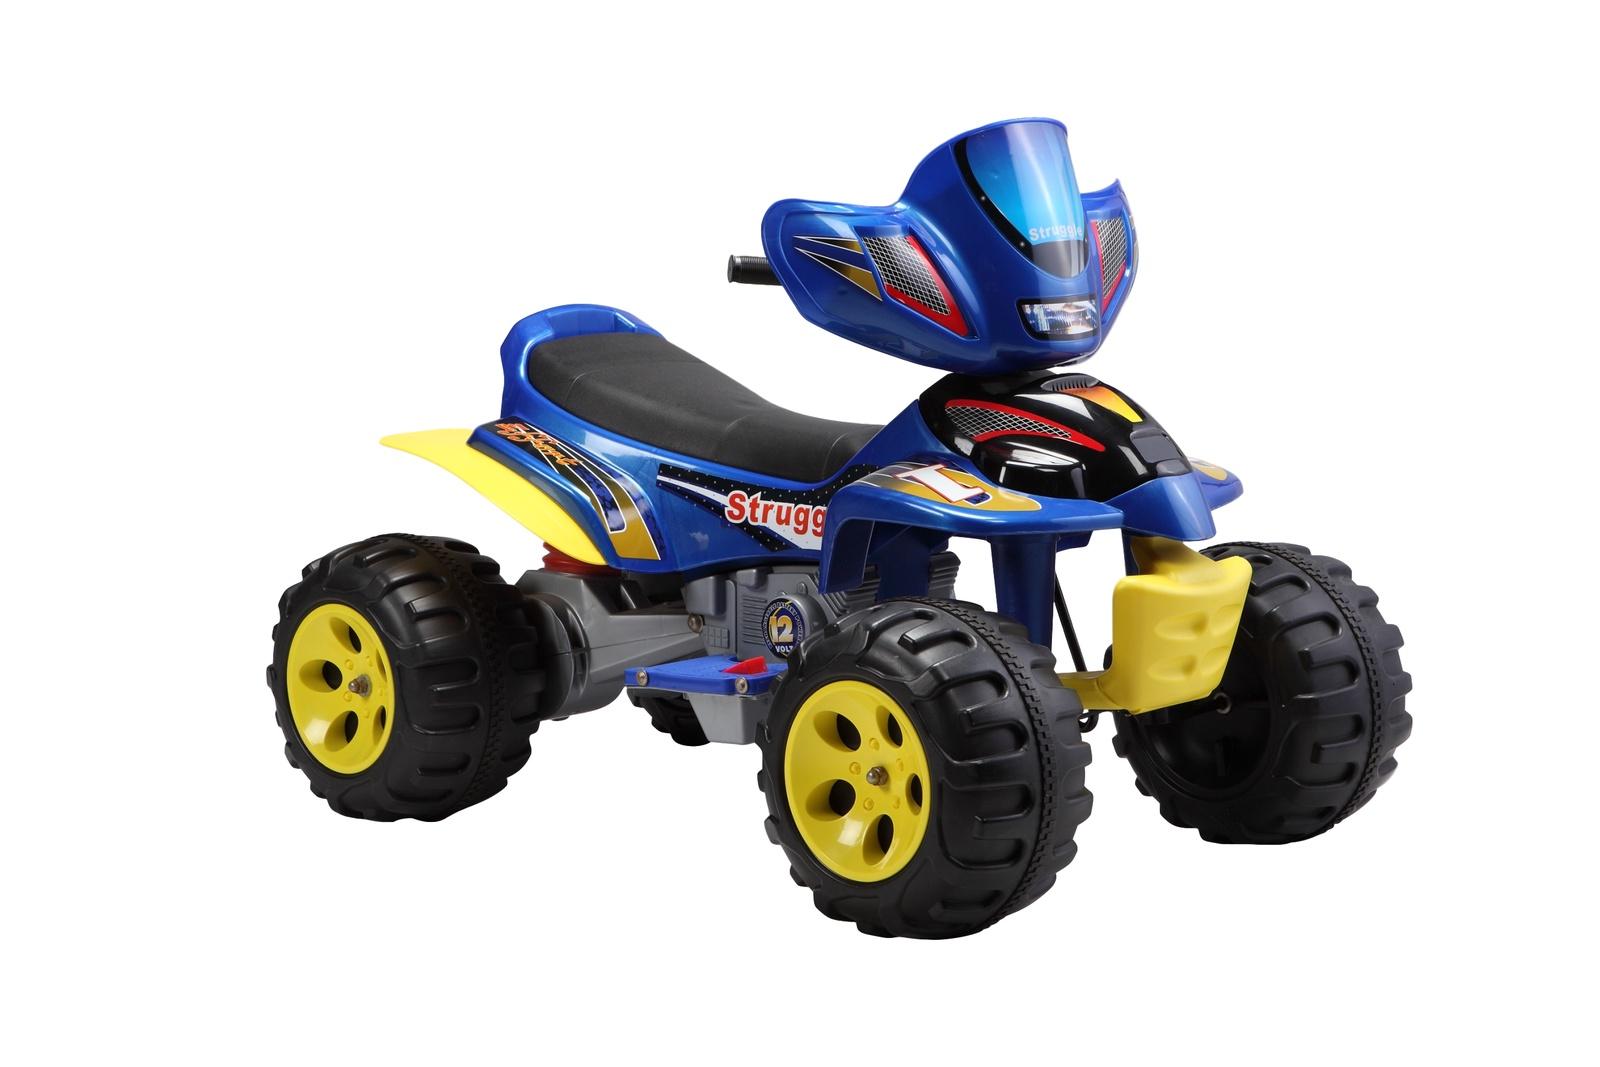 Электромотоцикл Farfello А22, синий kidscars электромобиль квадроцикл цвет черный